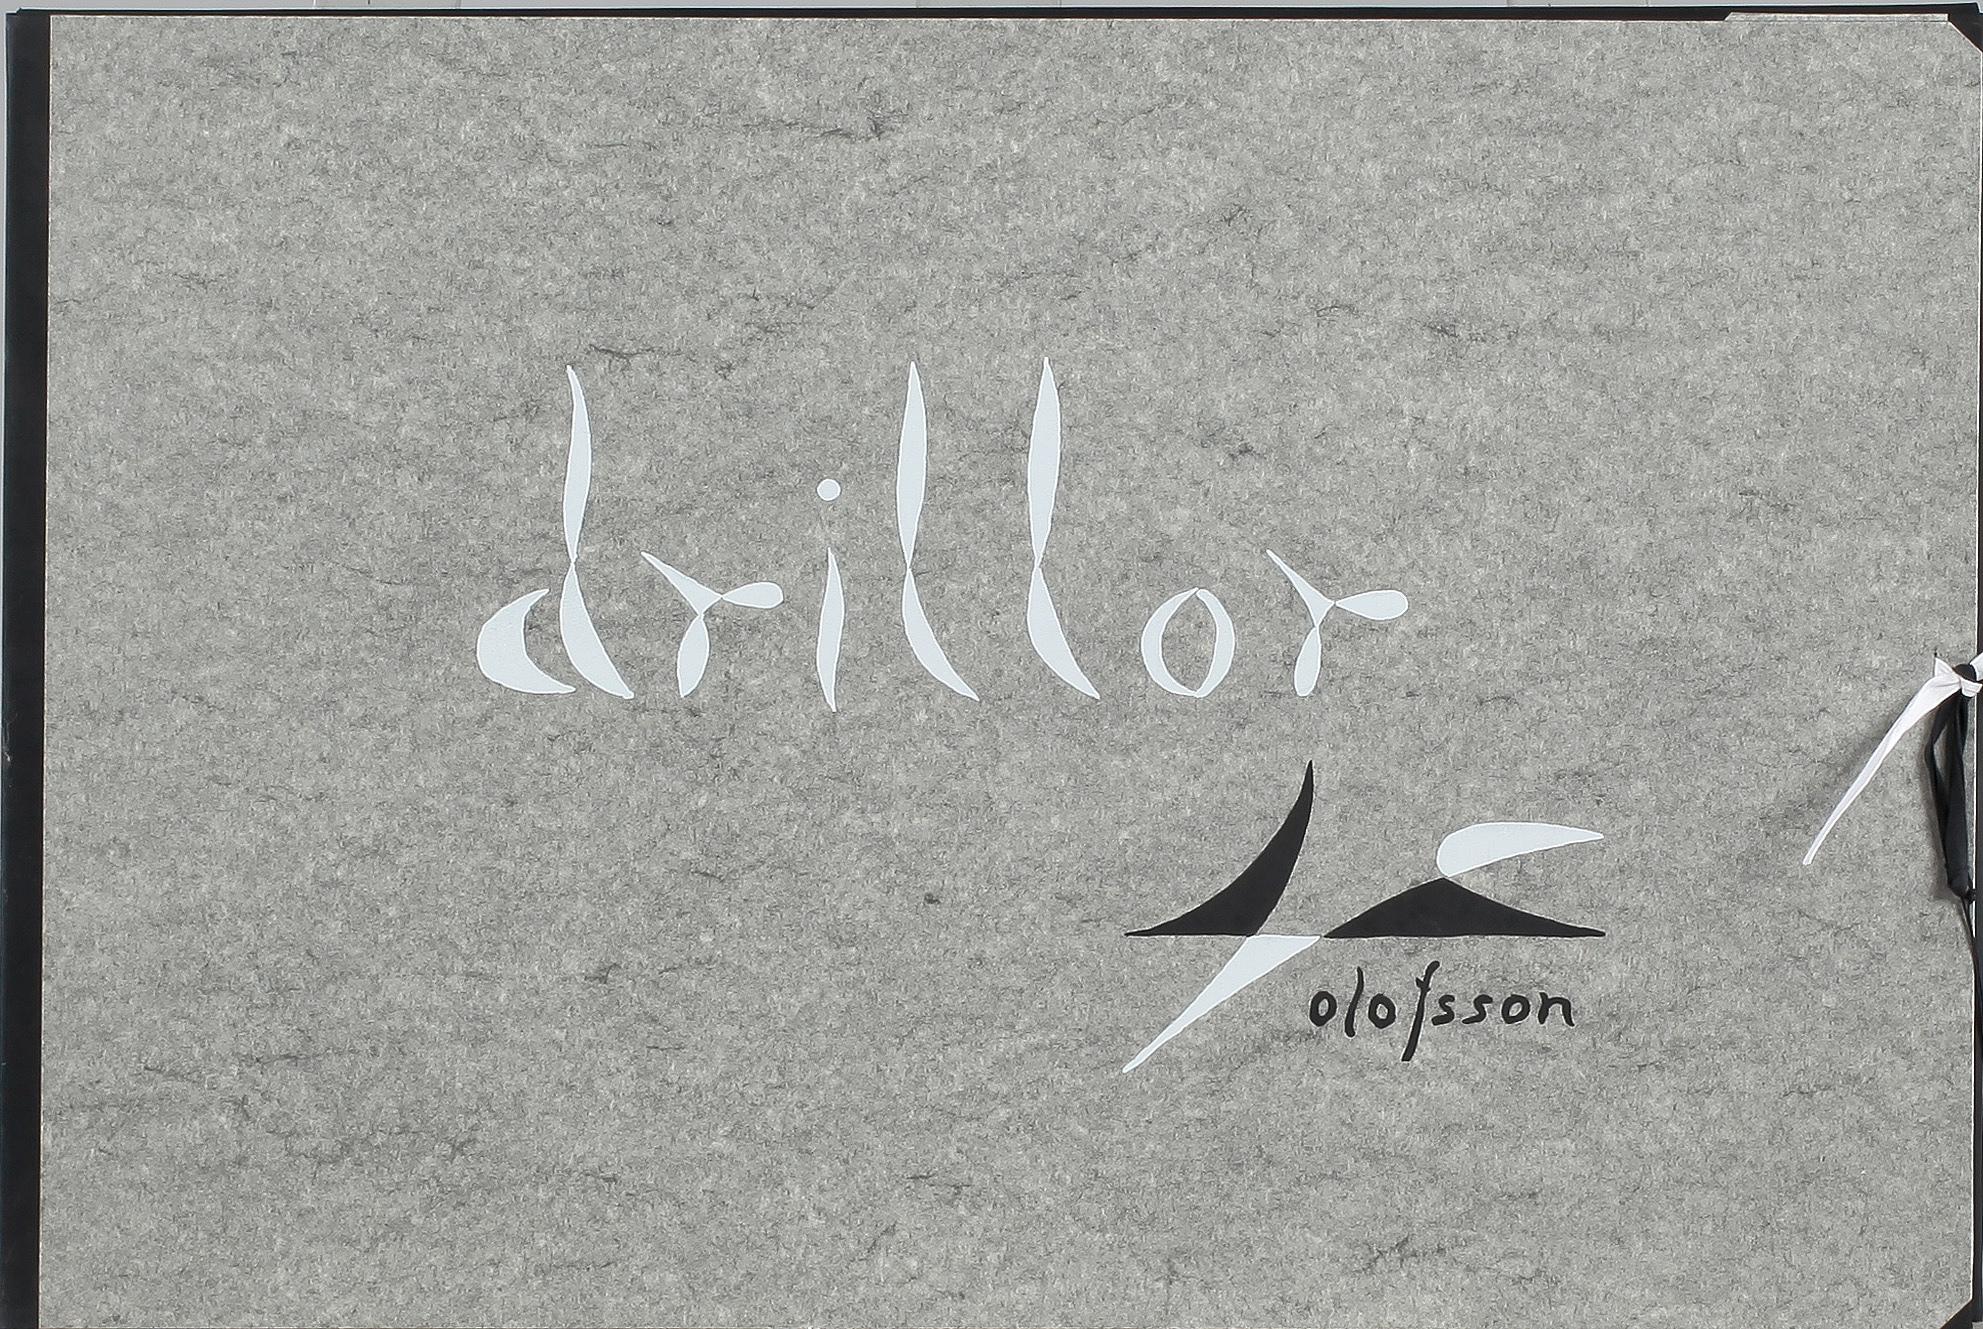 Pierre Olofsson, Drillor, mapp med 4 serigrafier